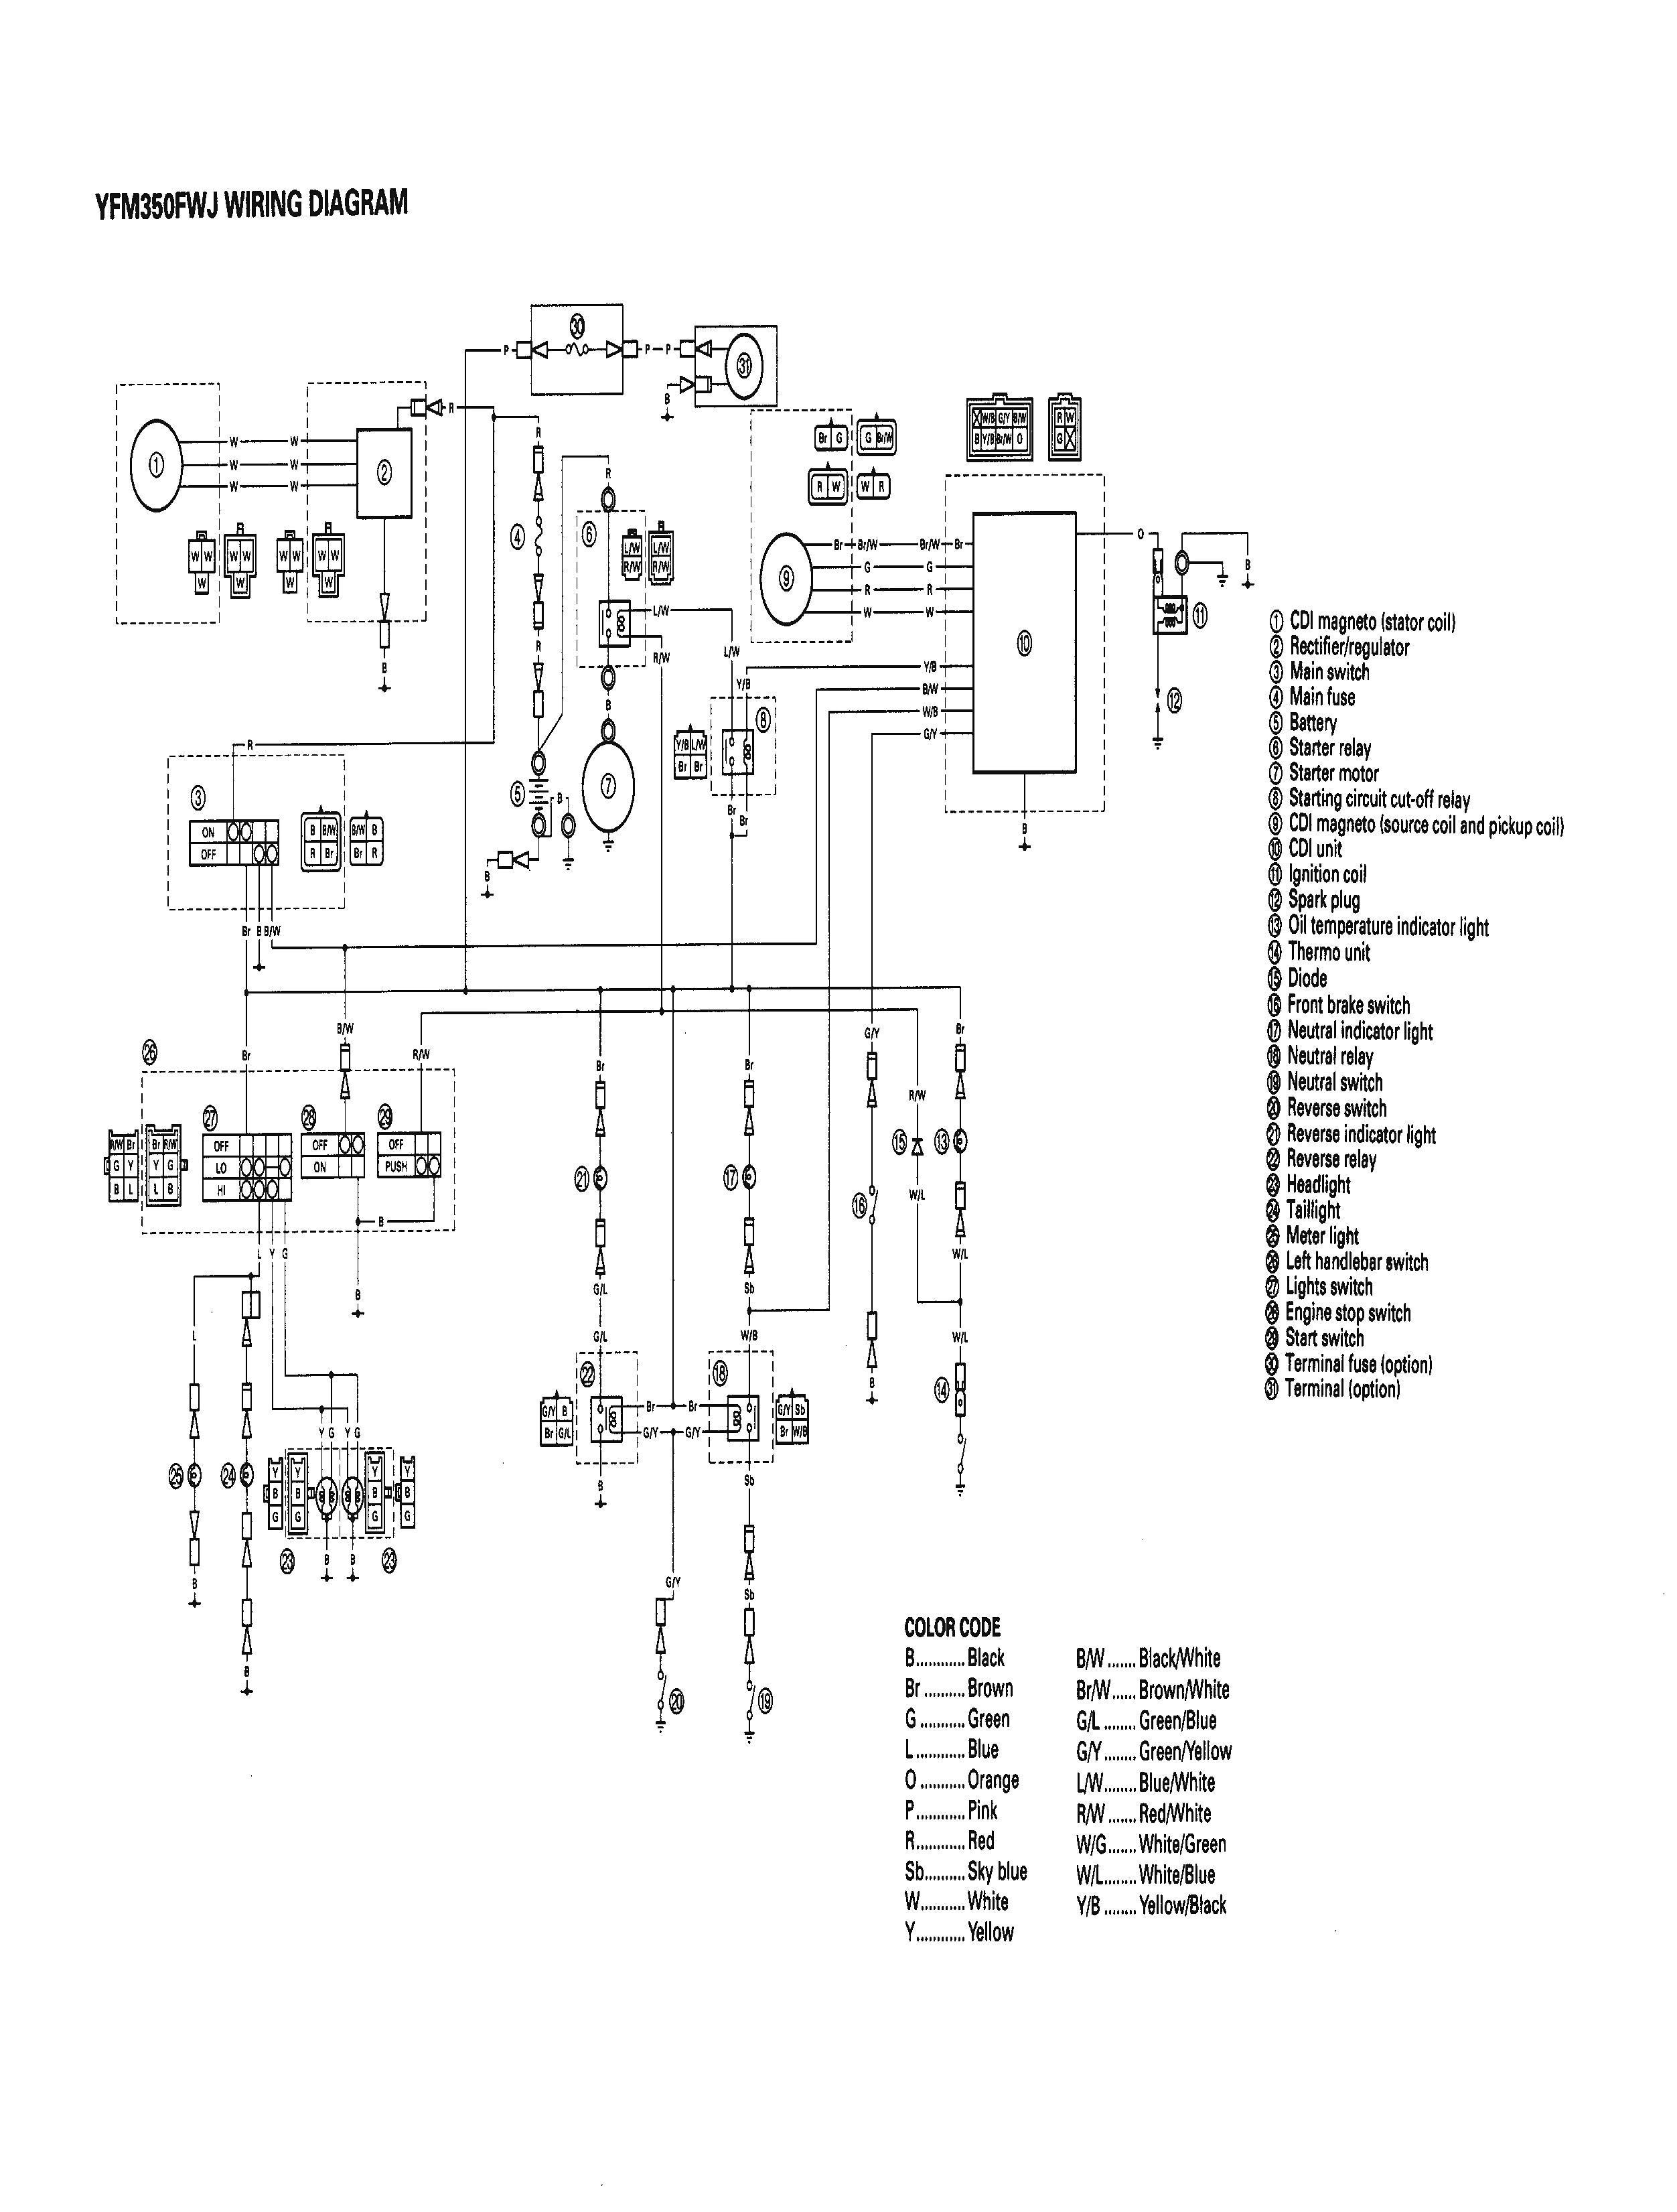 2006 Yamaha Rhino 660 Ignition Switch Wiring Diagram